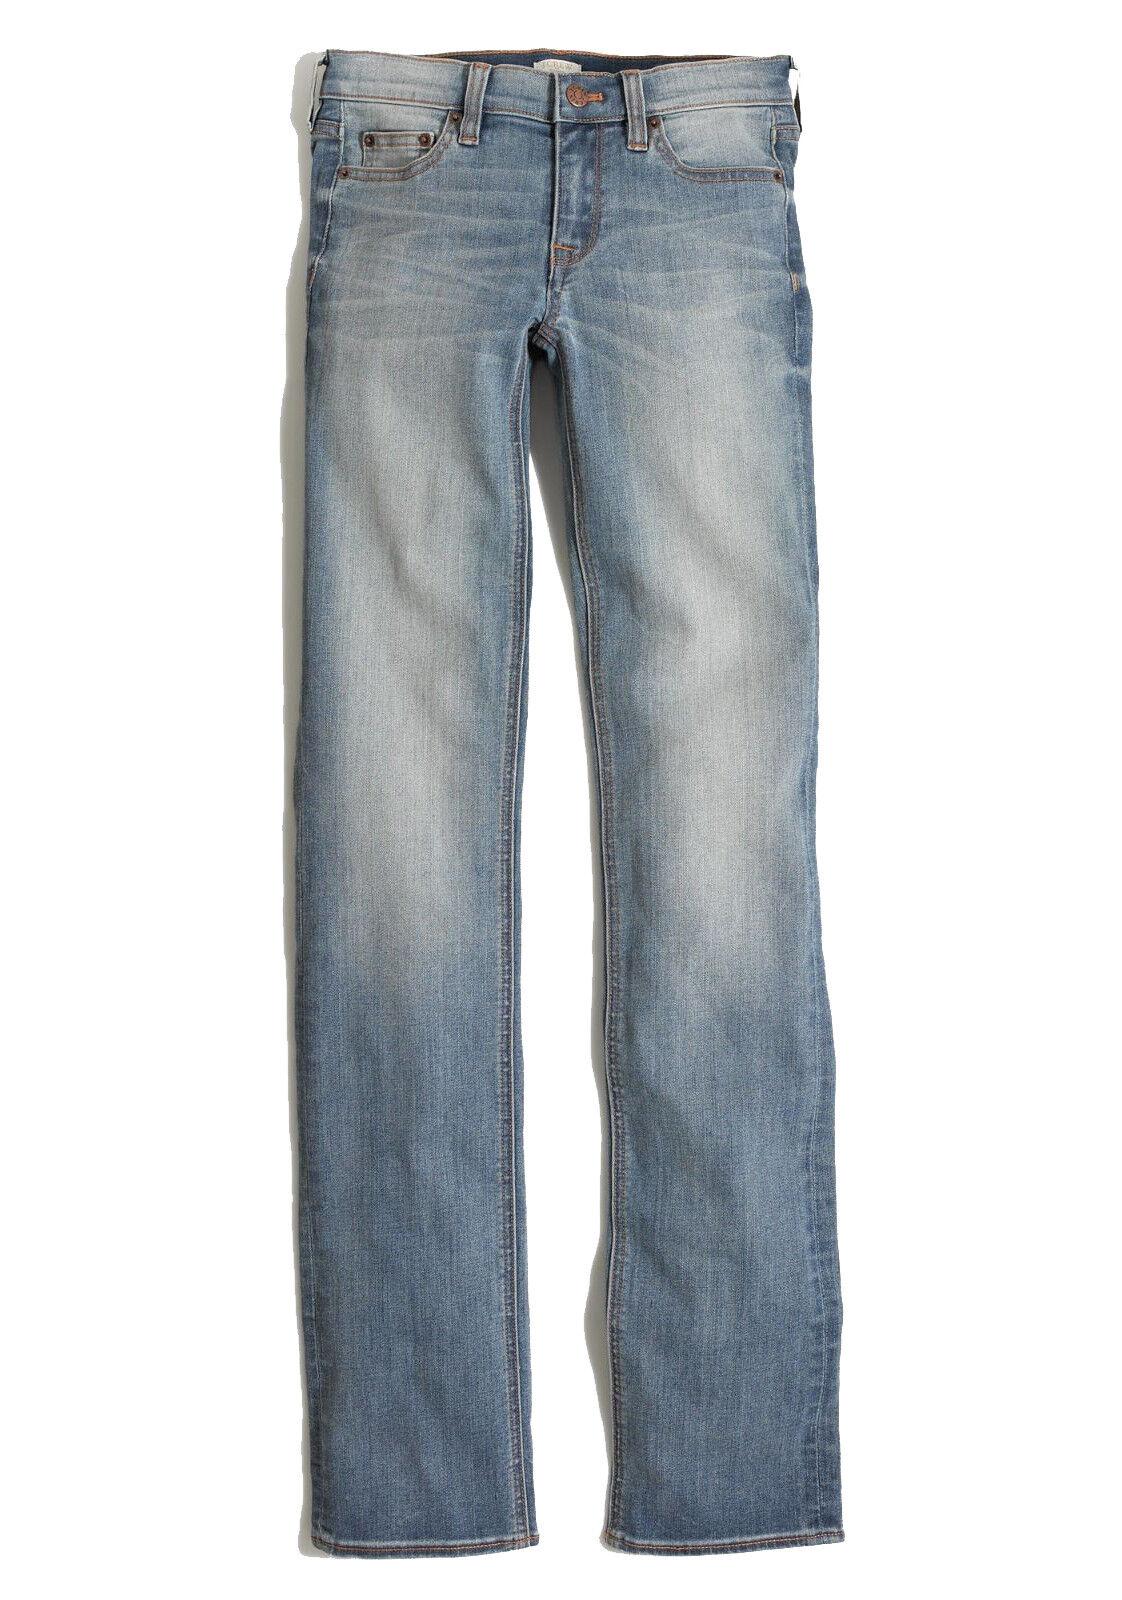 J.Crew Factory - Women's 32 (14) - NWT - 33  Davidson Wash Straight Leg Jeans